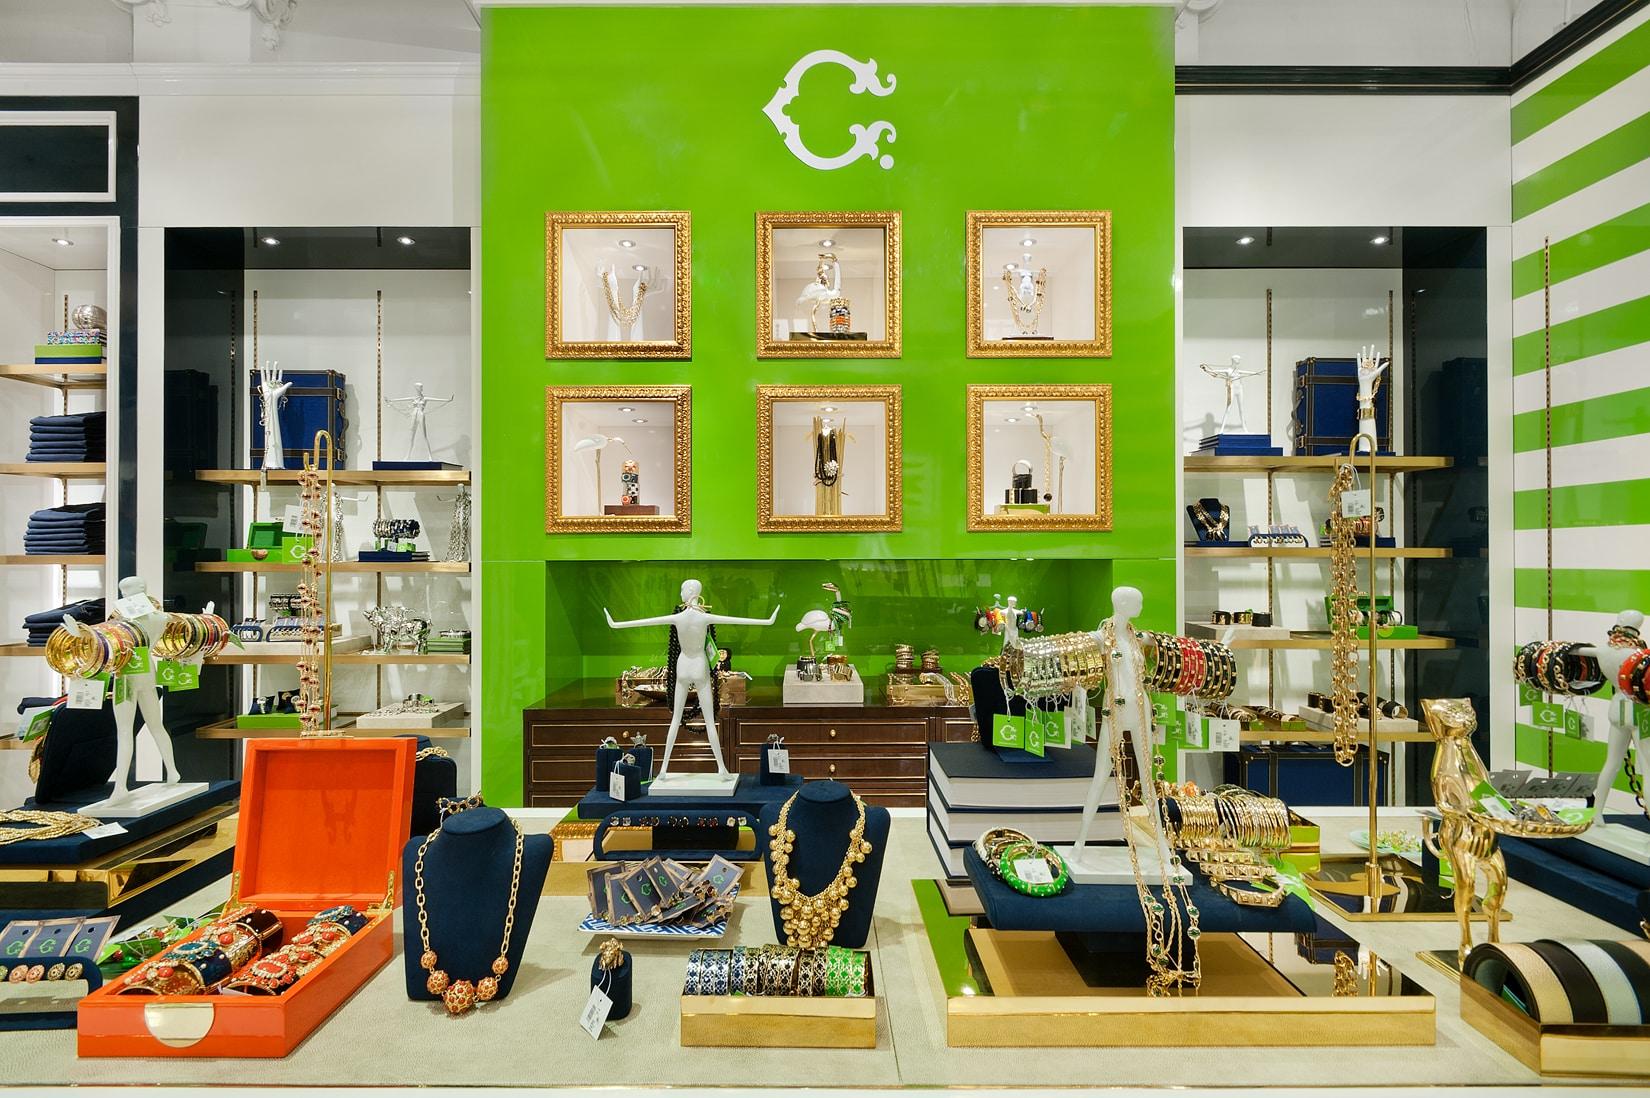 chris burch's store